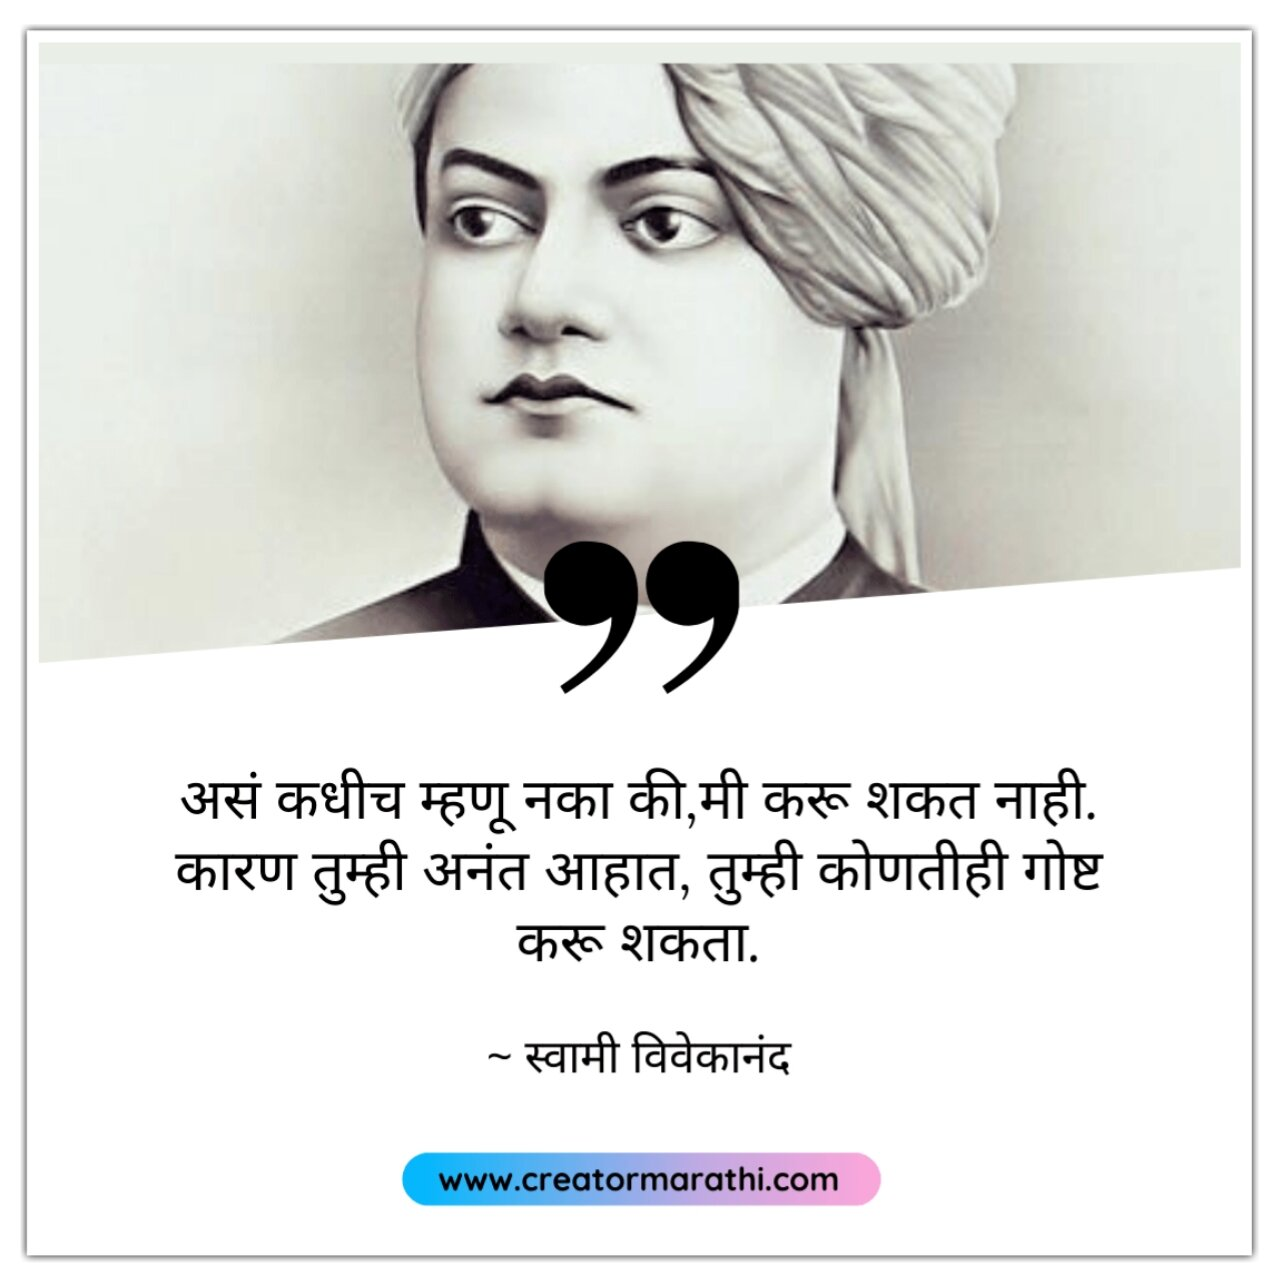 Swami Vivekananda motivational Thoughts In Marathi